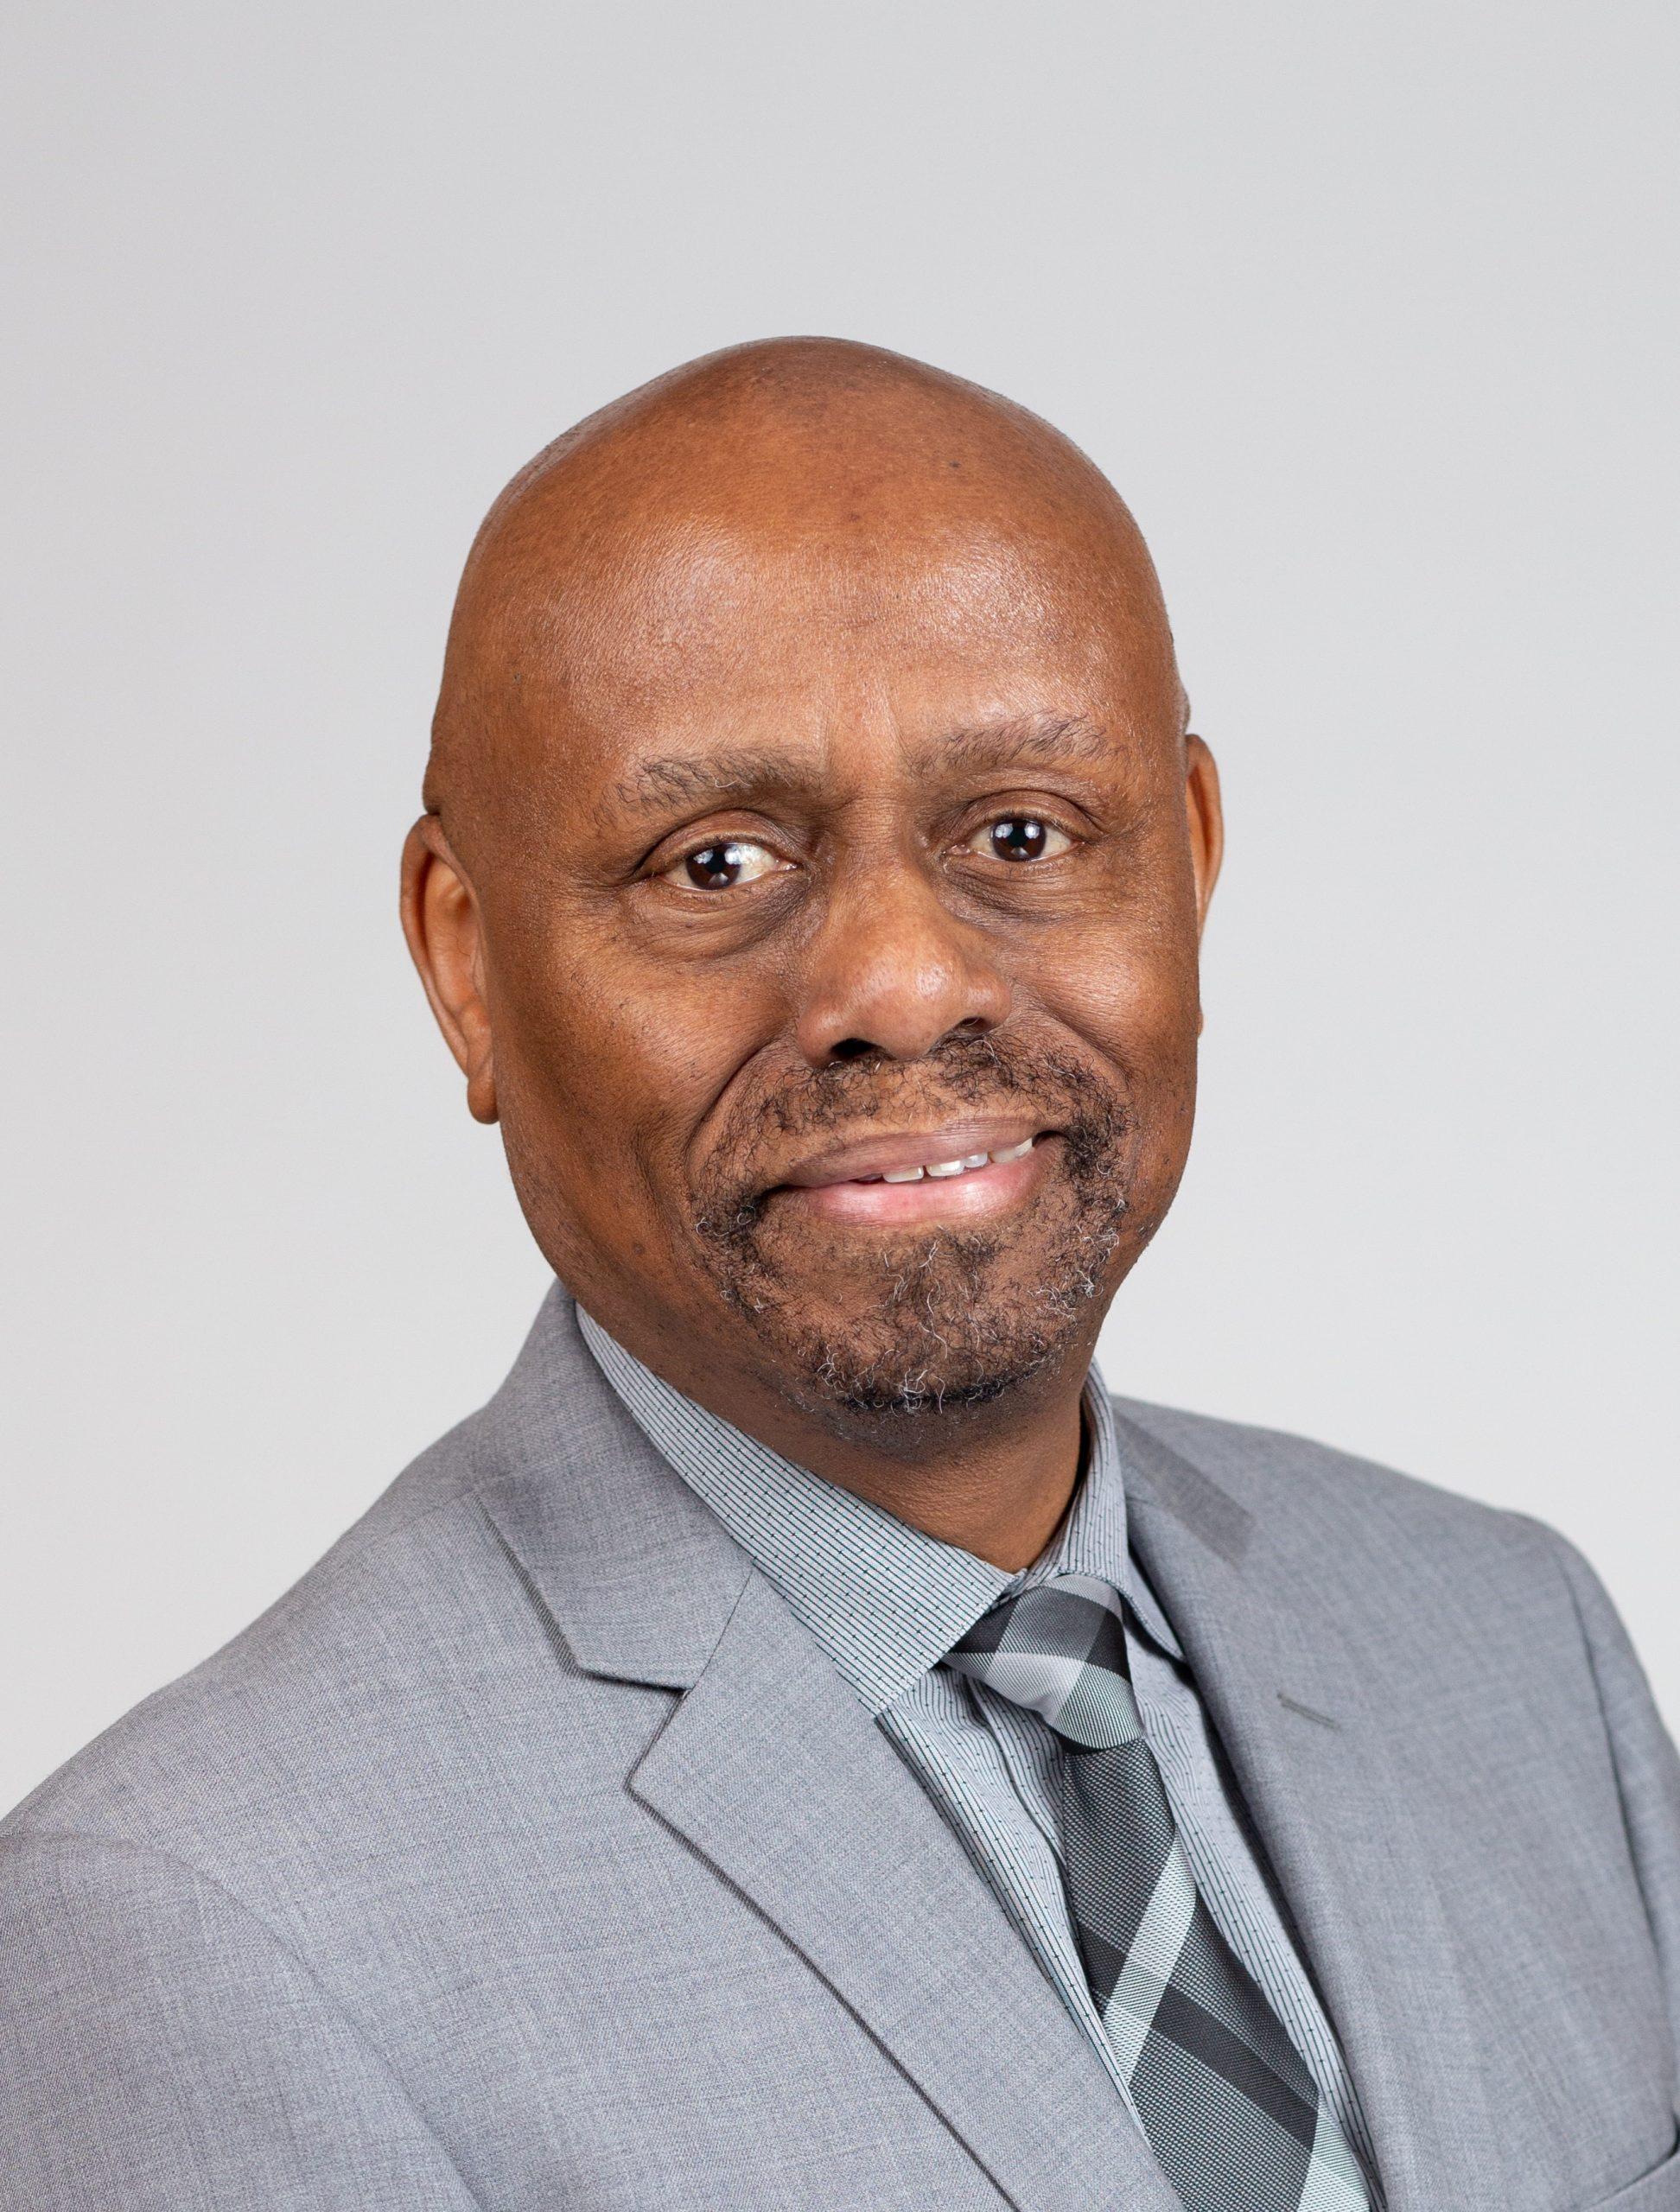 Honorable Prof. Dr. Sekazi K. Mtingwa<br>U.S. Nuclear Regulatory Commission<br>North Carolina, United States